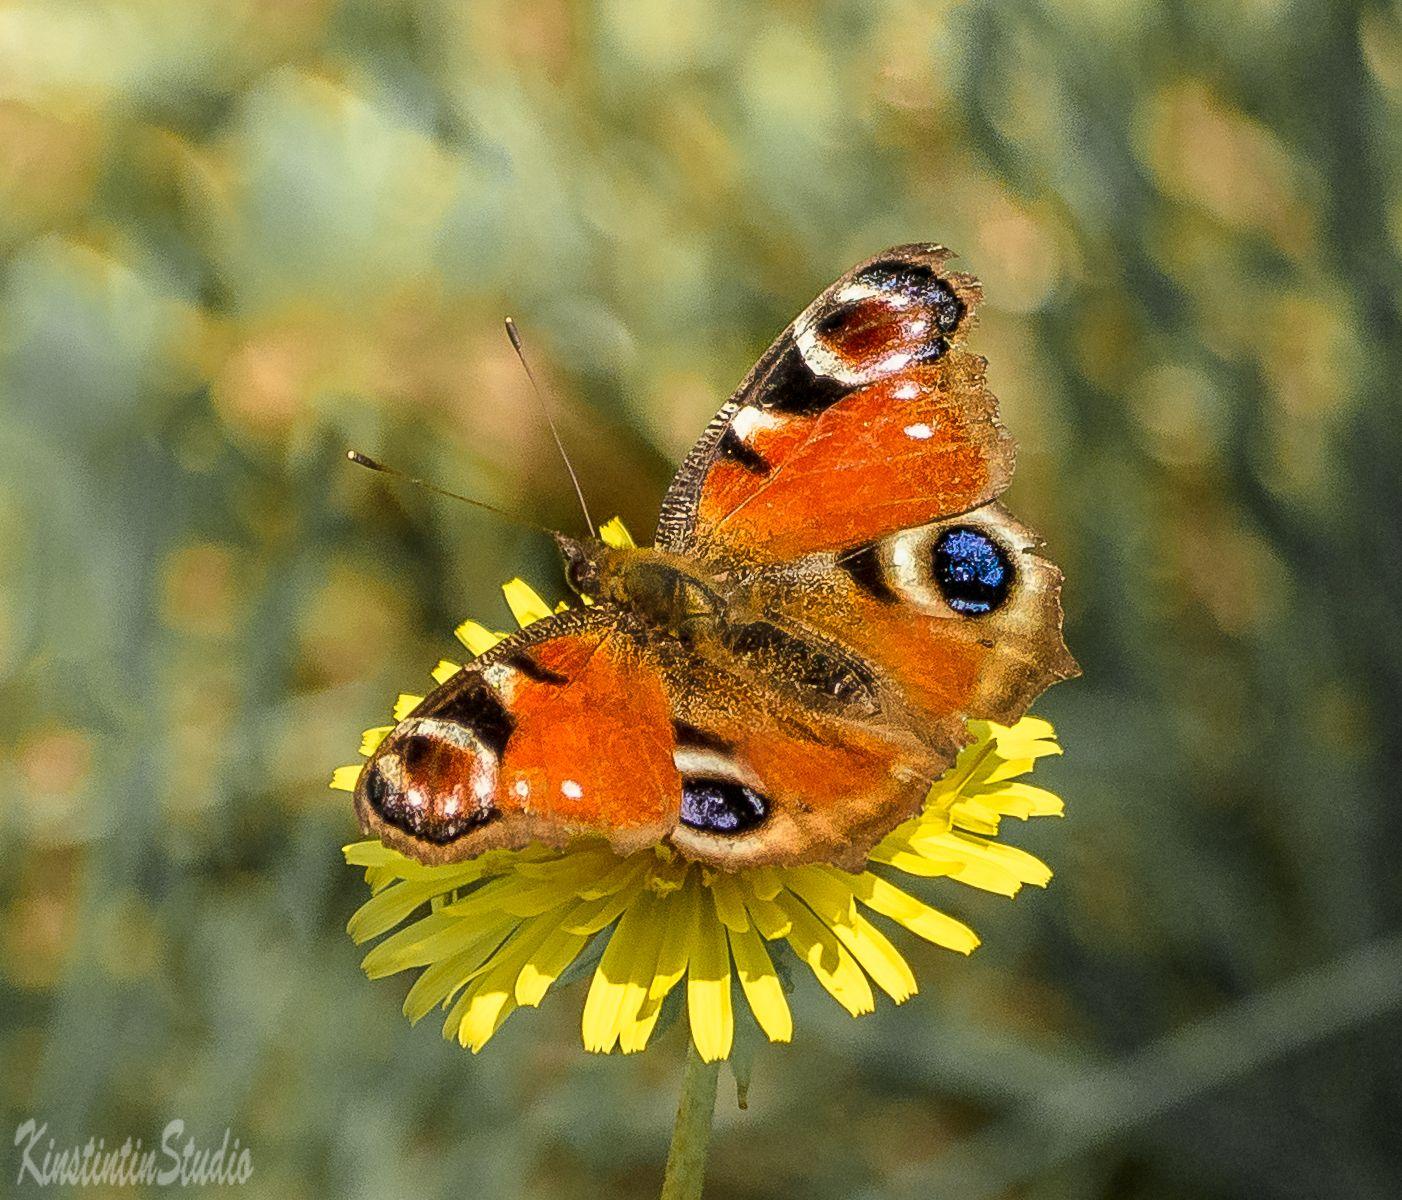 Бабочка и одуванчик... бабочка одуванчик май весна